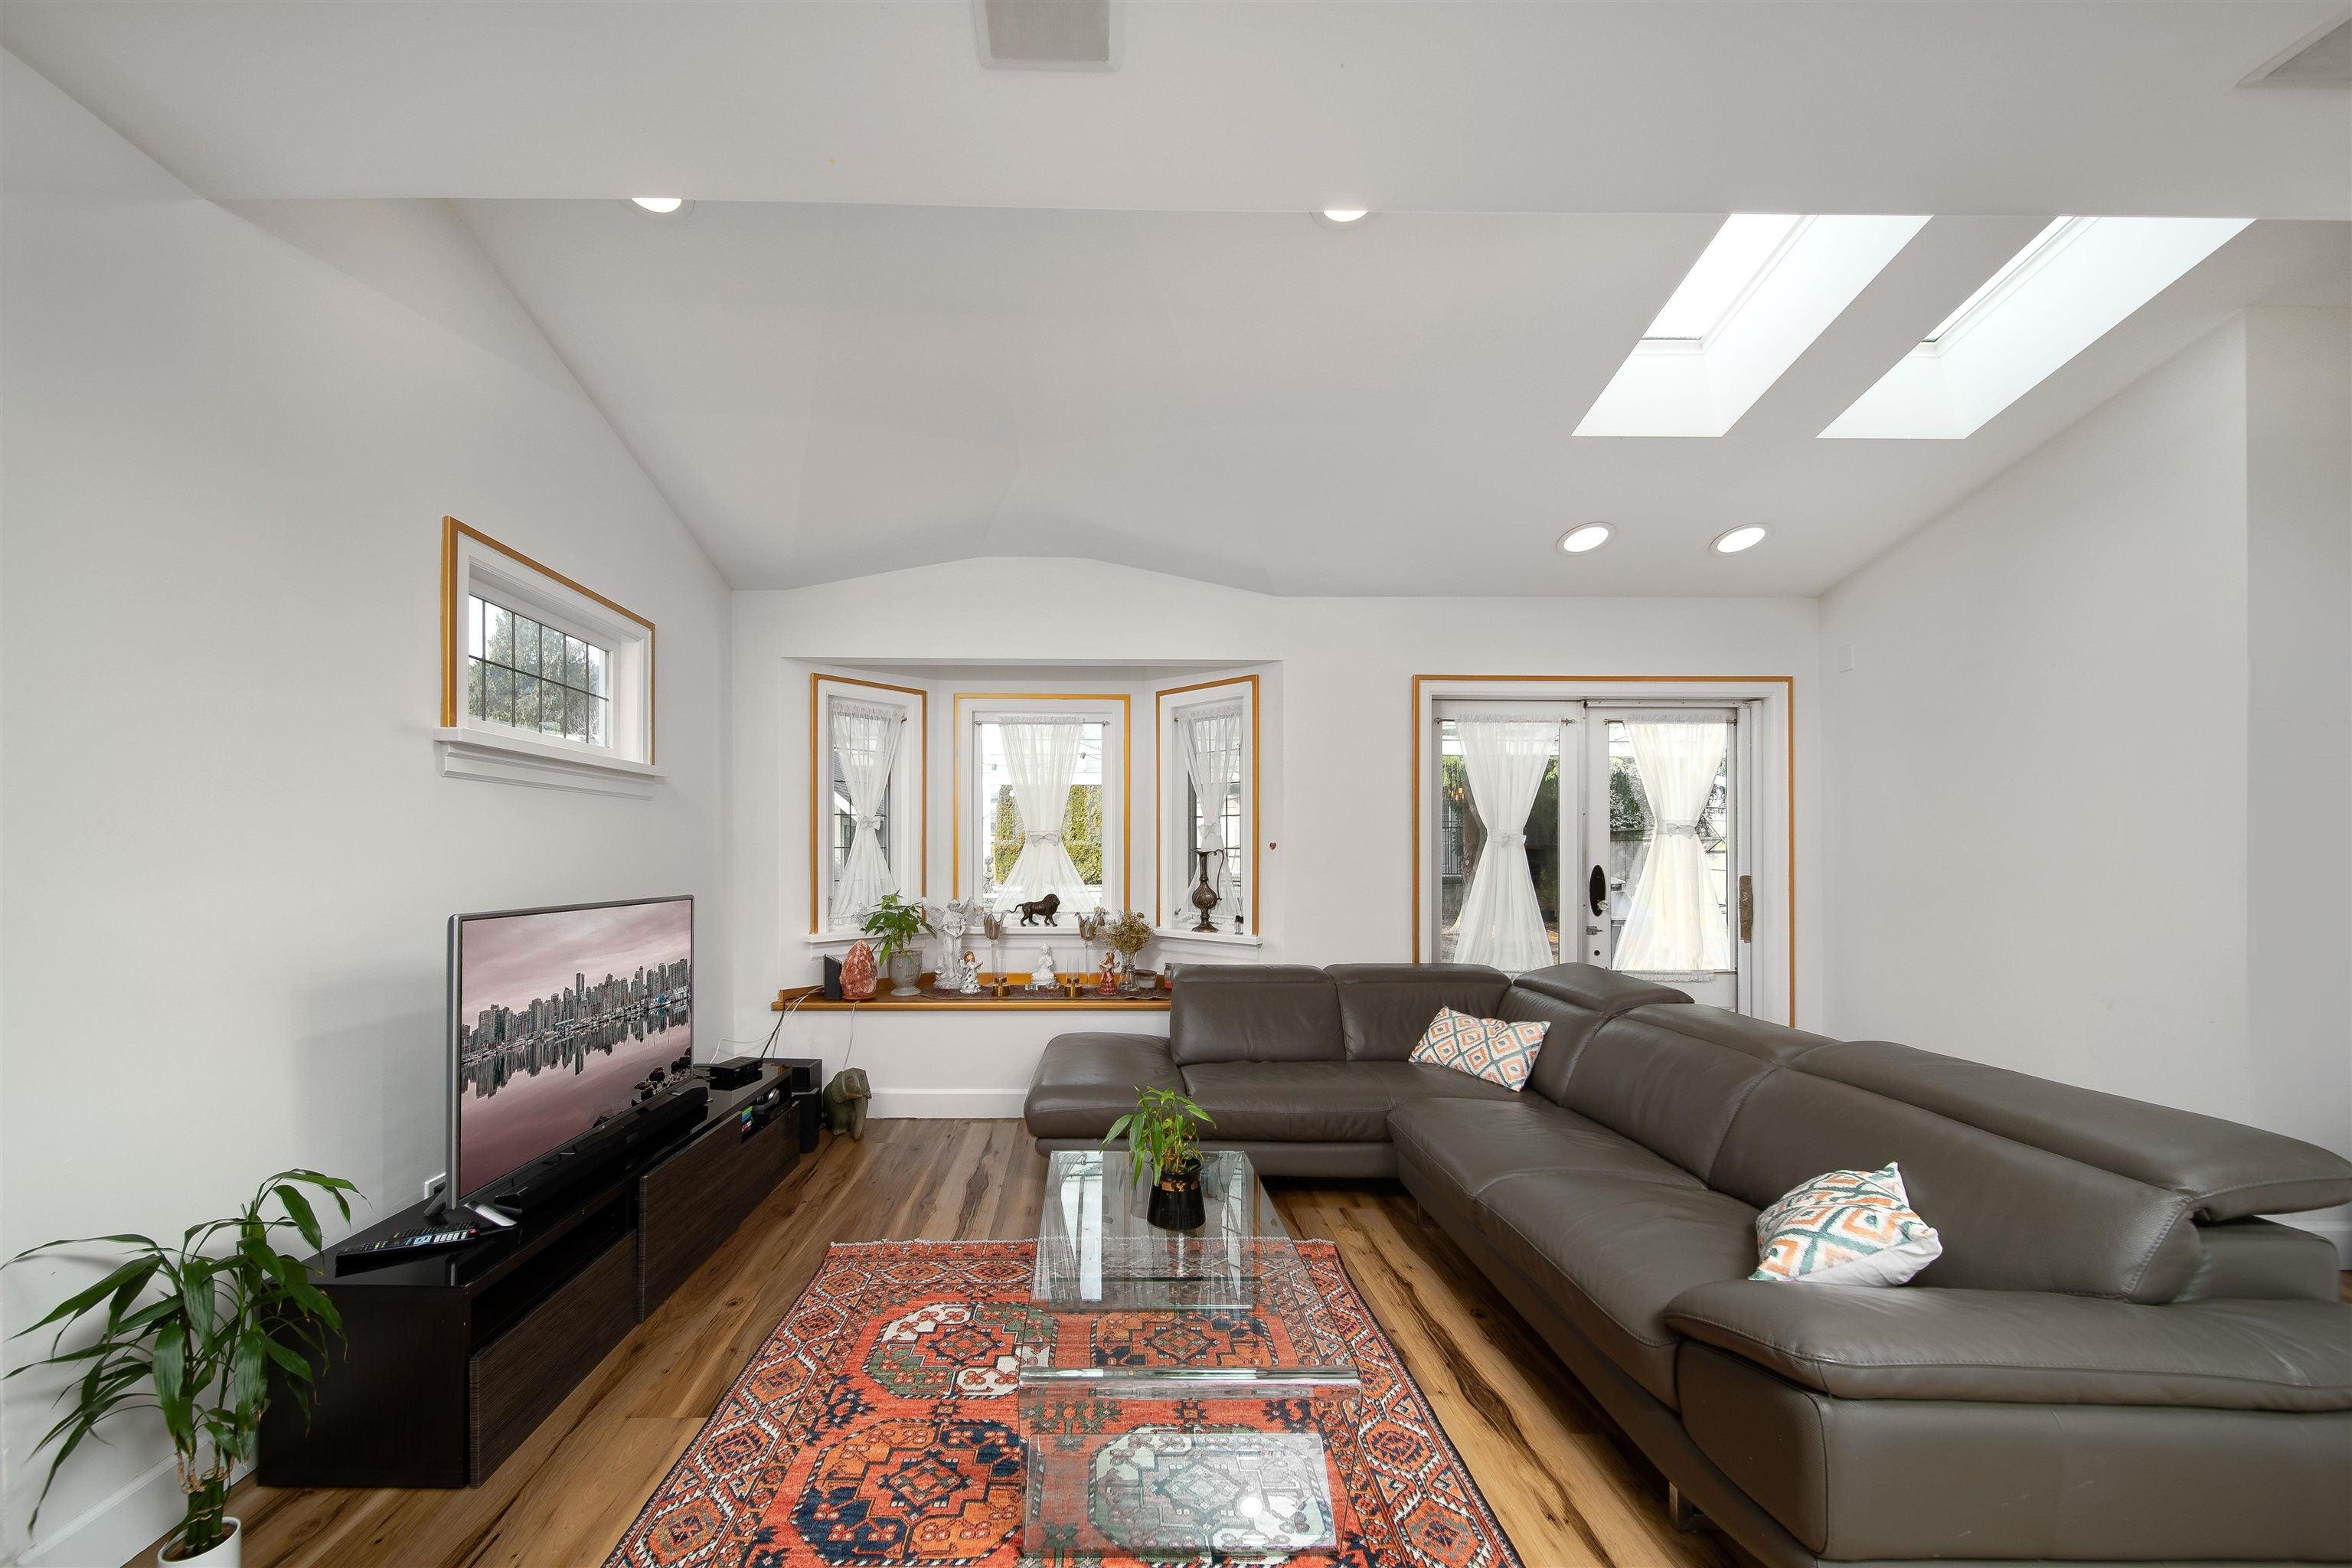 1357 FULTON AVENUE - Ambleside House/Single Family for sale, 6 Bedrooms (R2617731) - #14